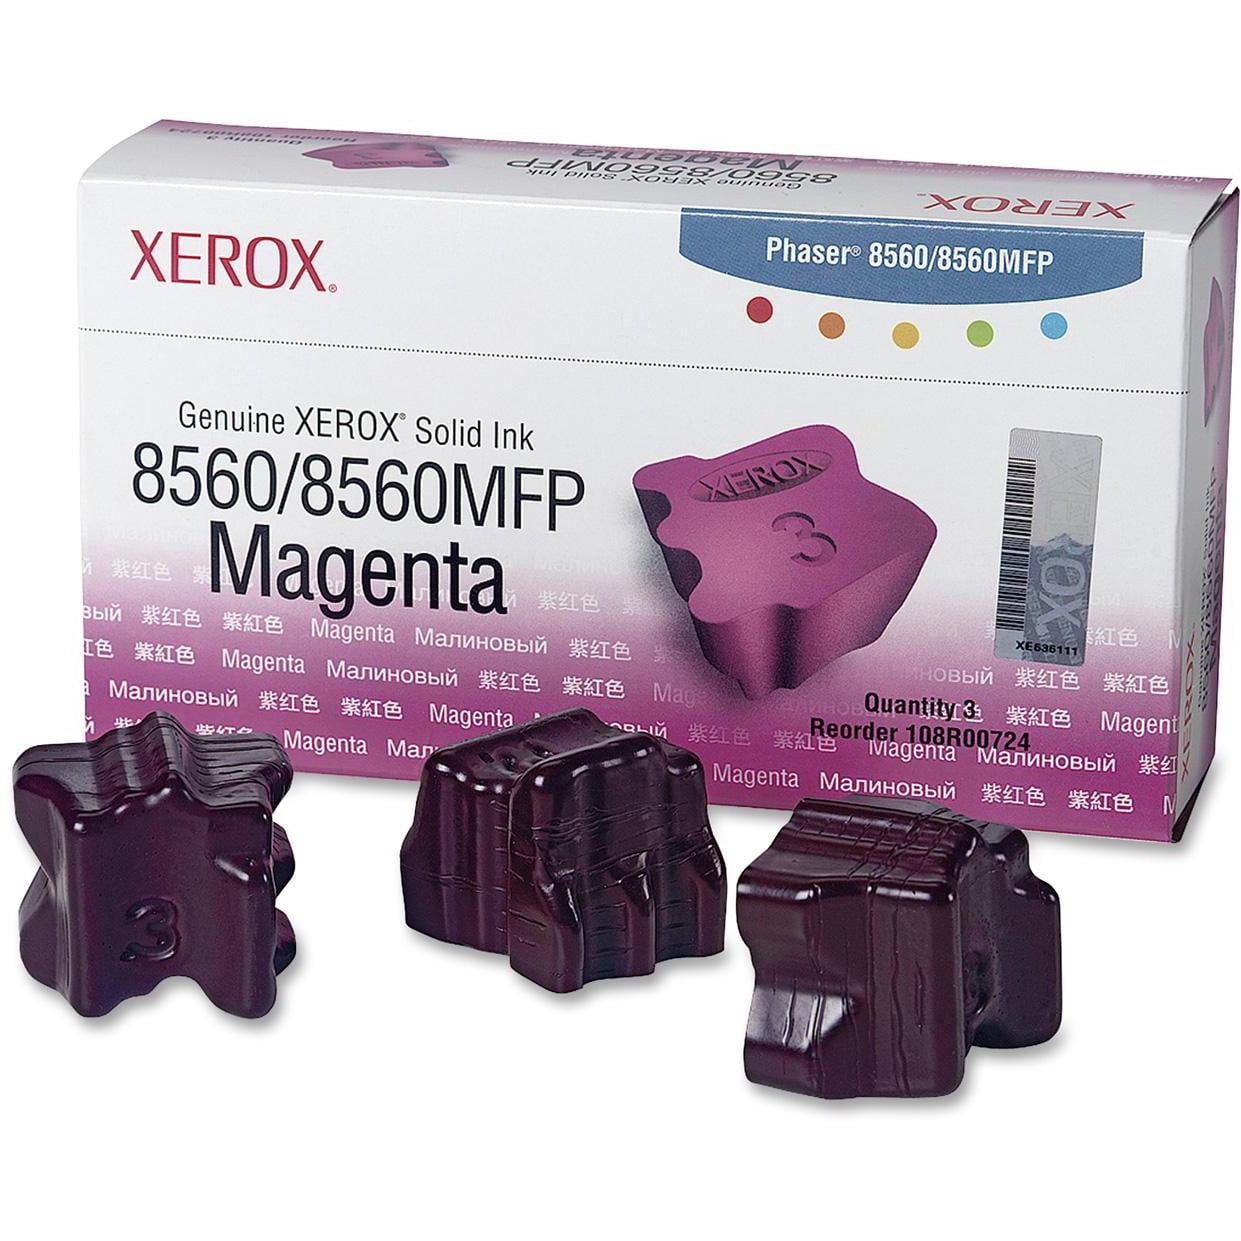 Xerox Solid Ink Stick, 3 / Box (Quantity)